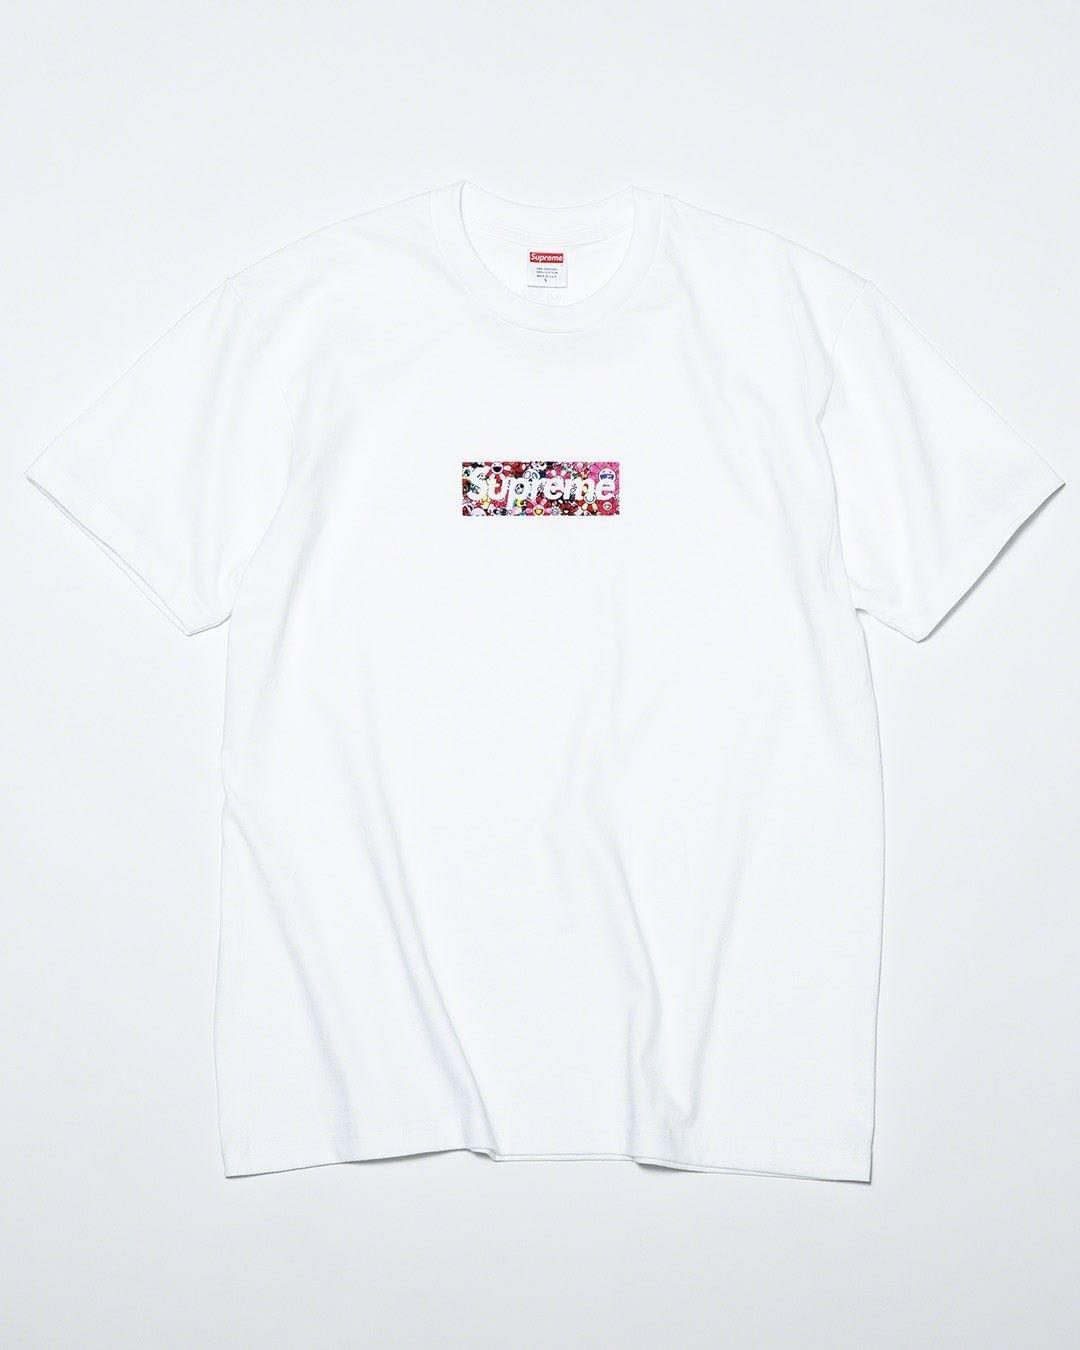 Takashi Murakami,Supreme,Box L  潮流圈最顶级联名!村上隆 x Supreme Bogo Tee 本周发售!